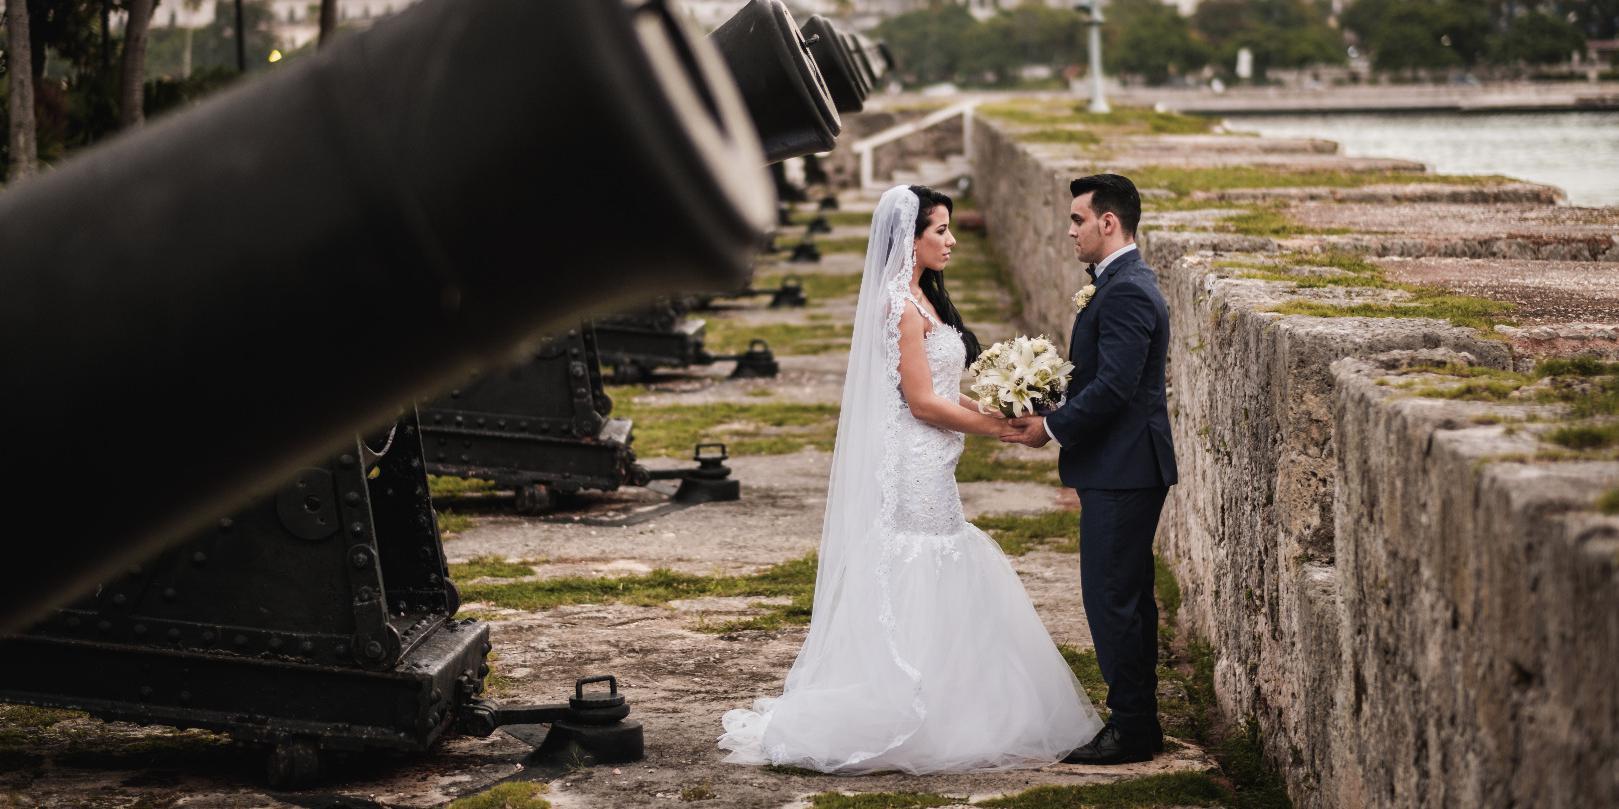 bodas-sin-clasificar-sin-tema-cuba-35701.jpg